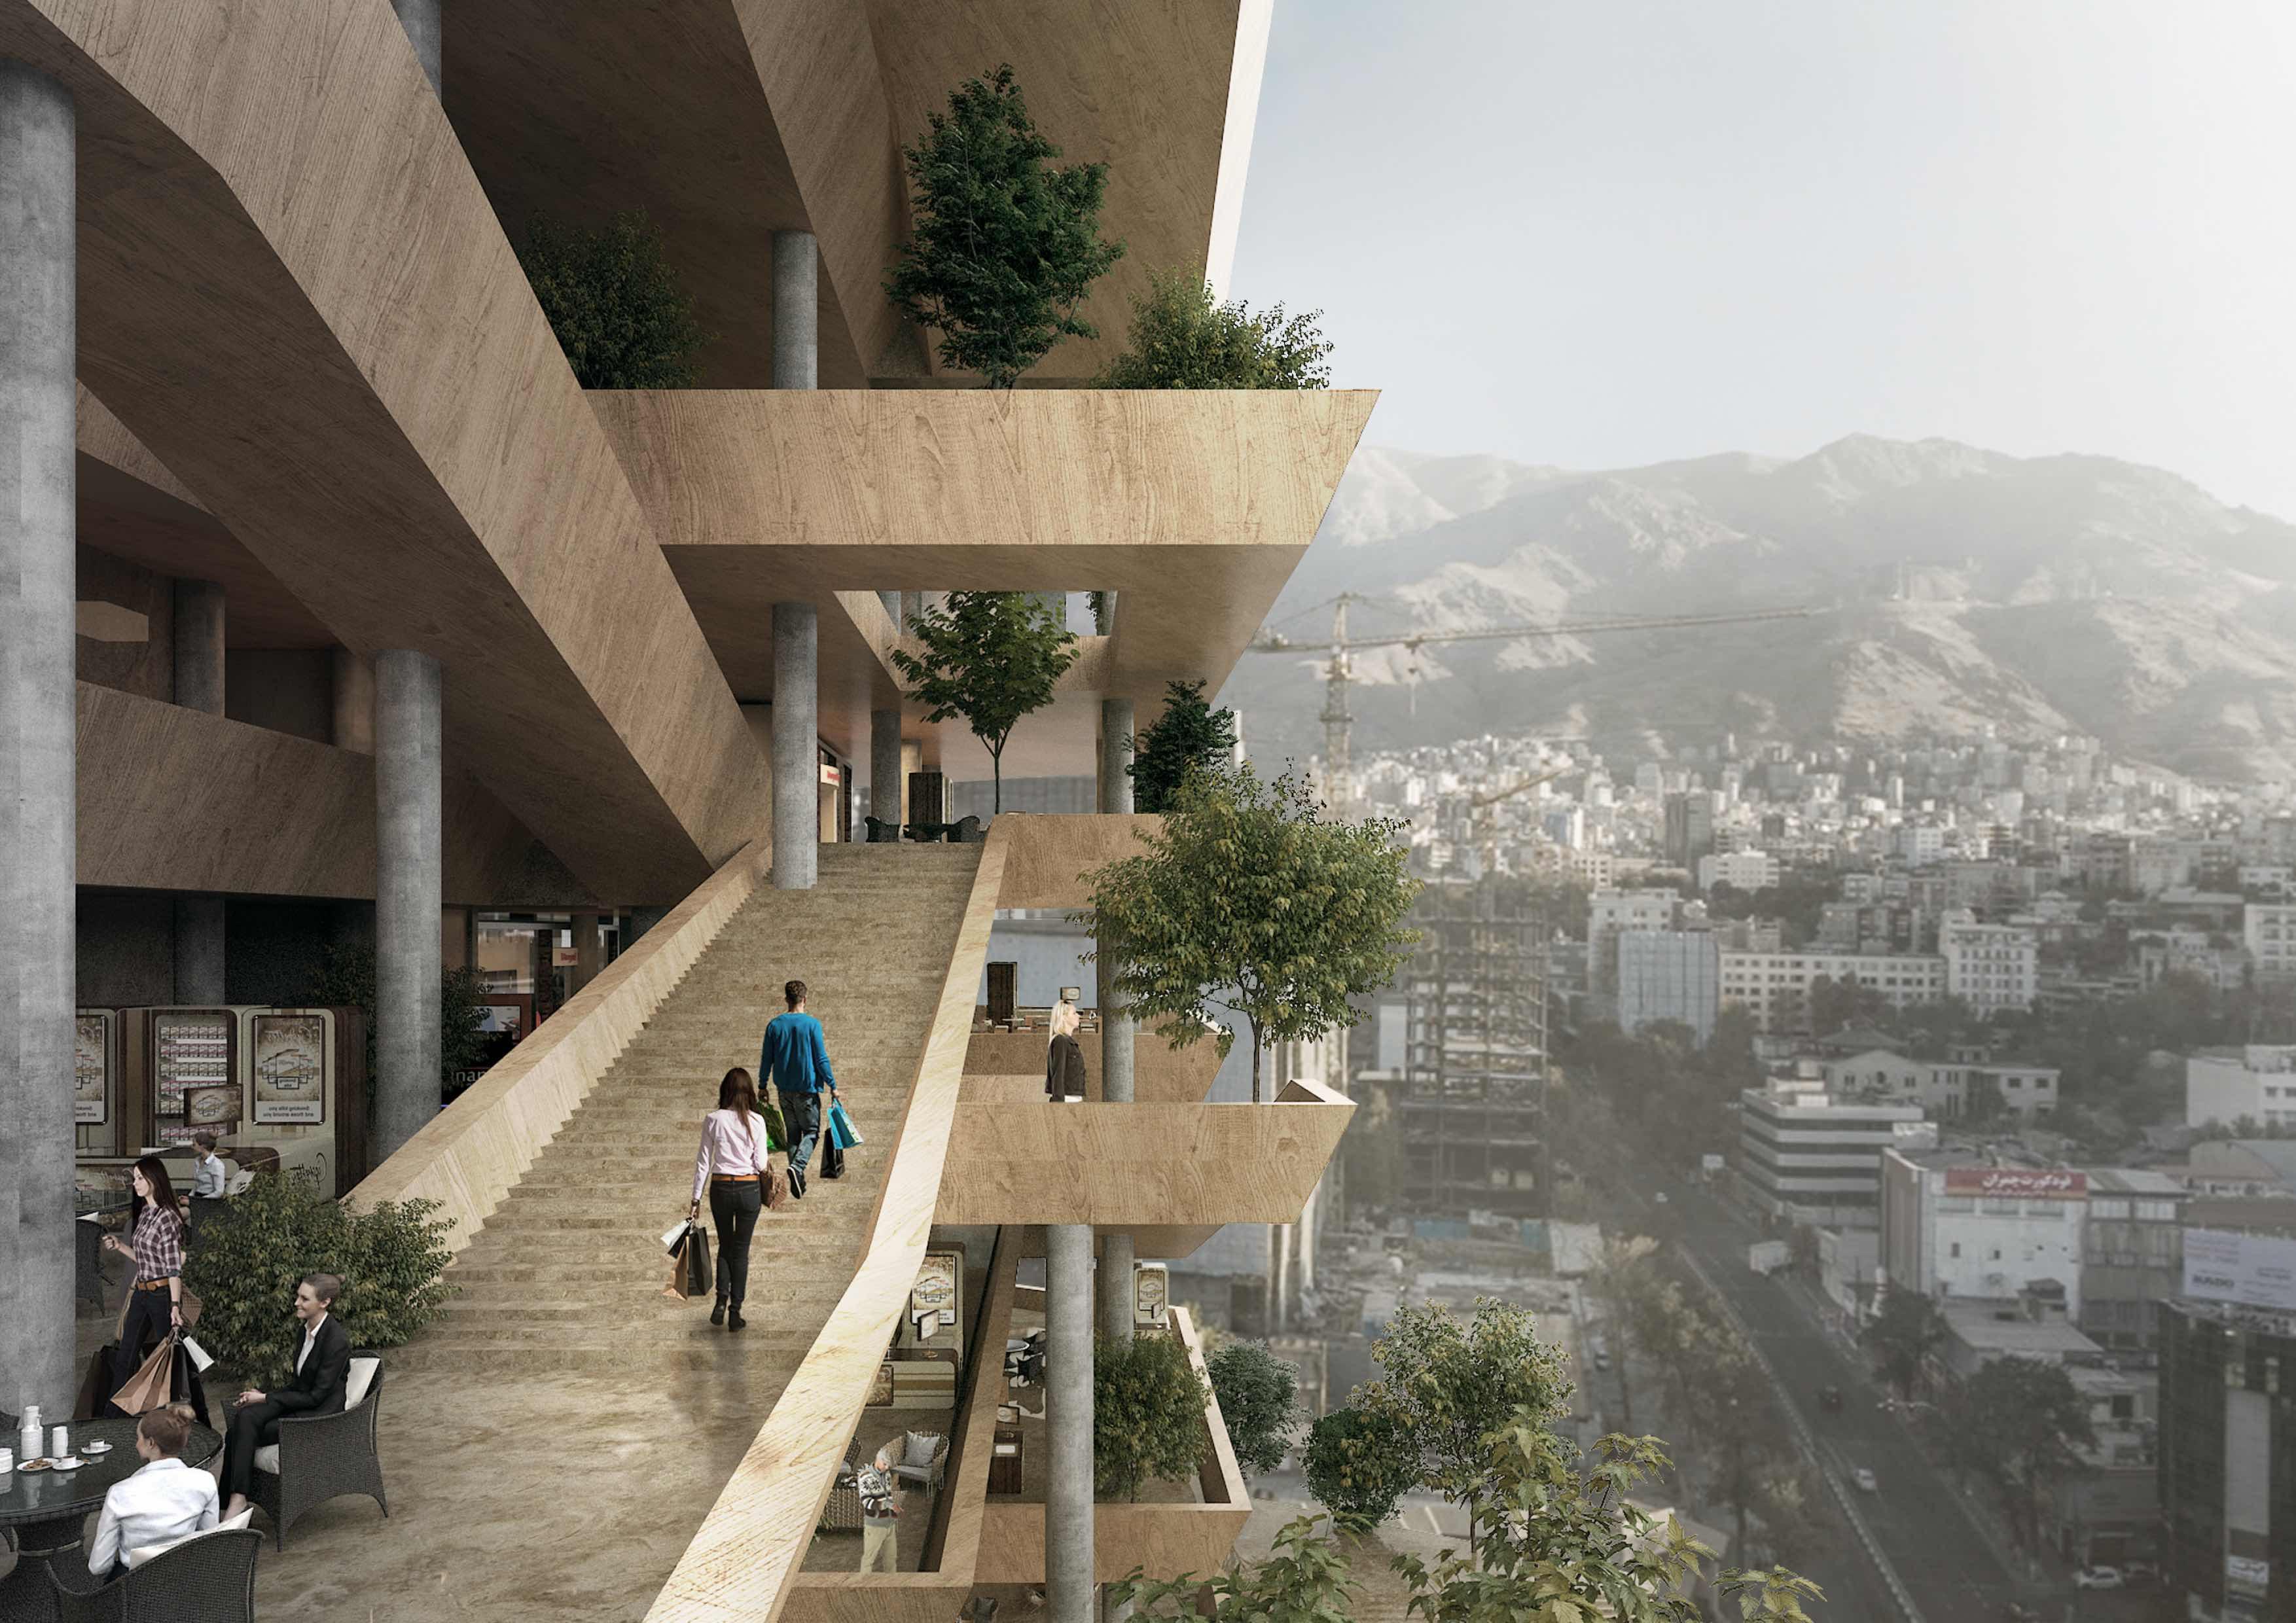 Tehran_Eye_Vertical_Street_Farshad_Mehdizadeh%20_AmazingArchitecture_005.jpg